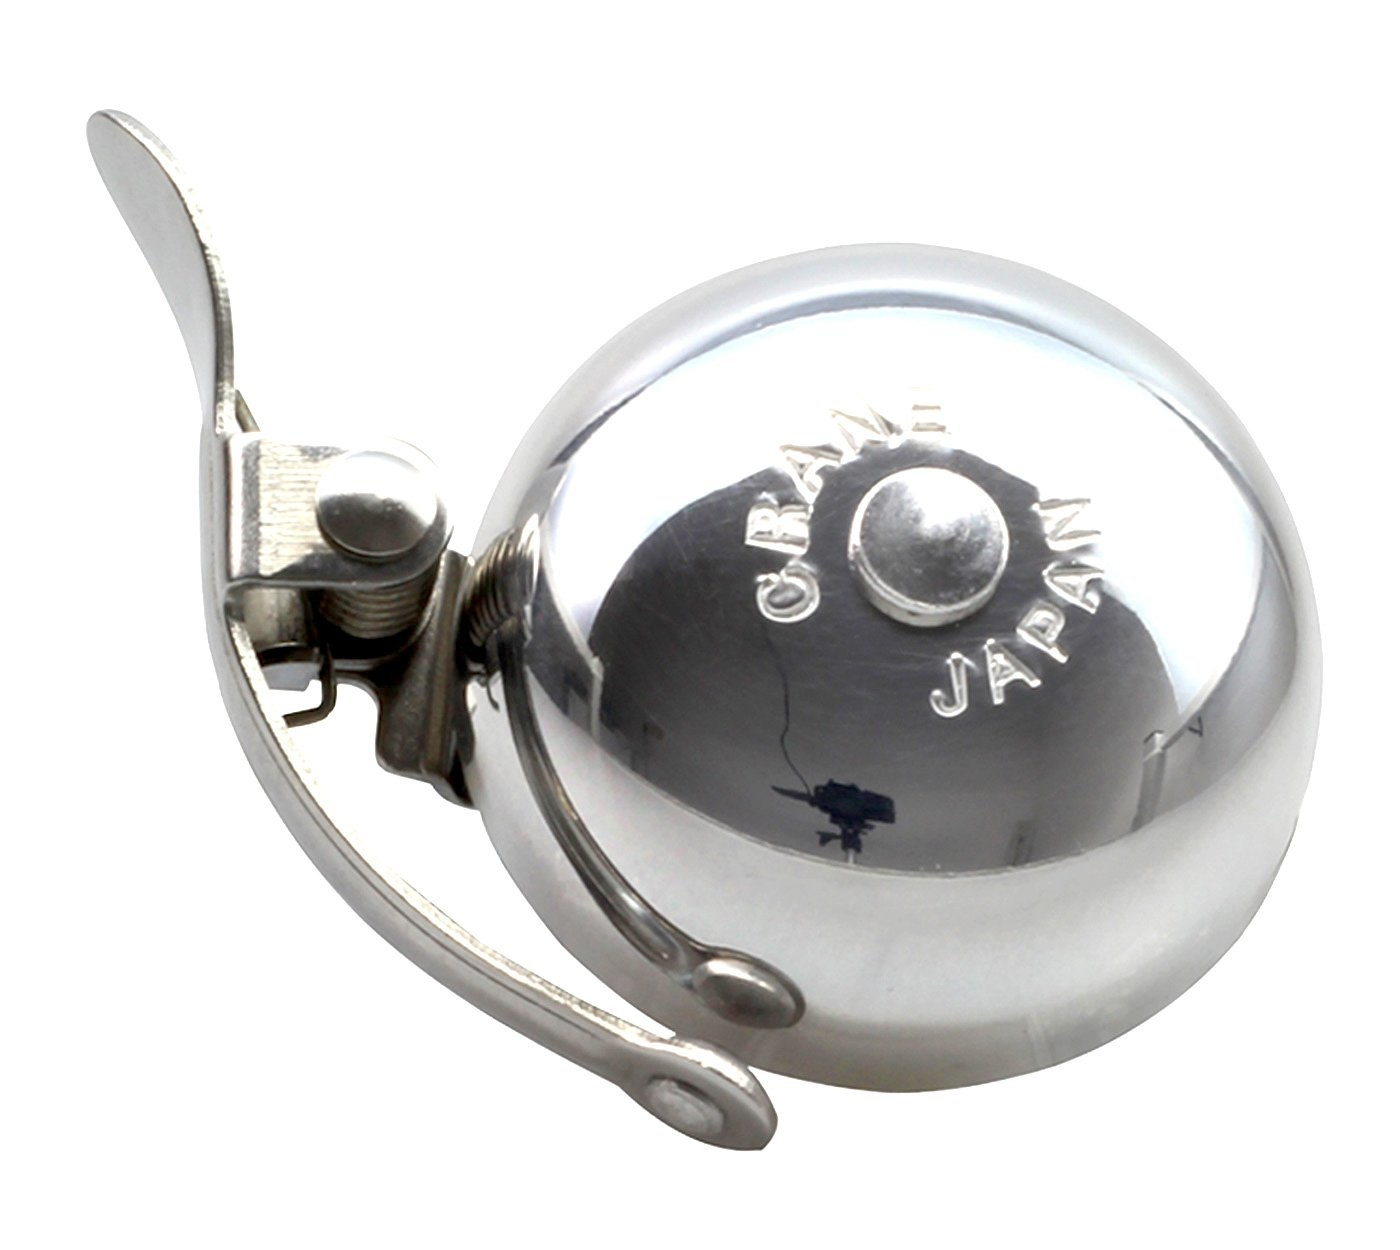 Mini Suzu Glocke - Silber Poliert